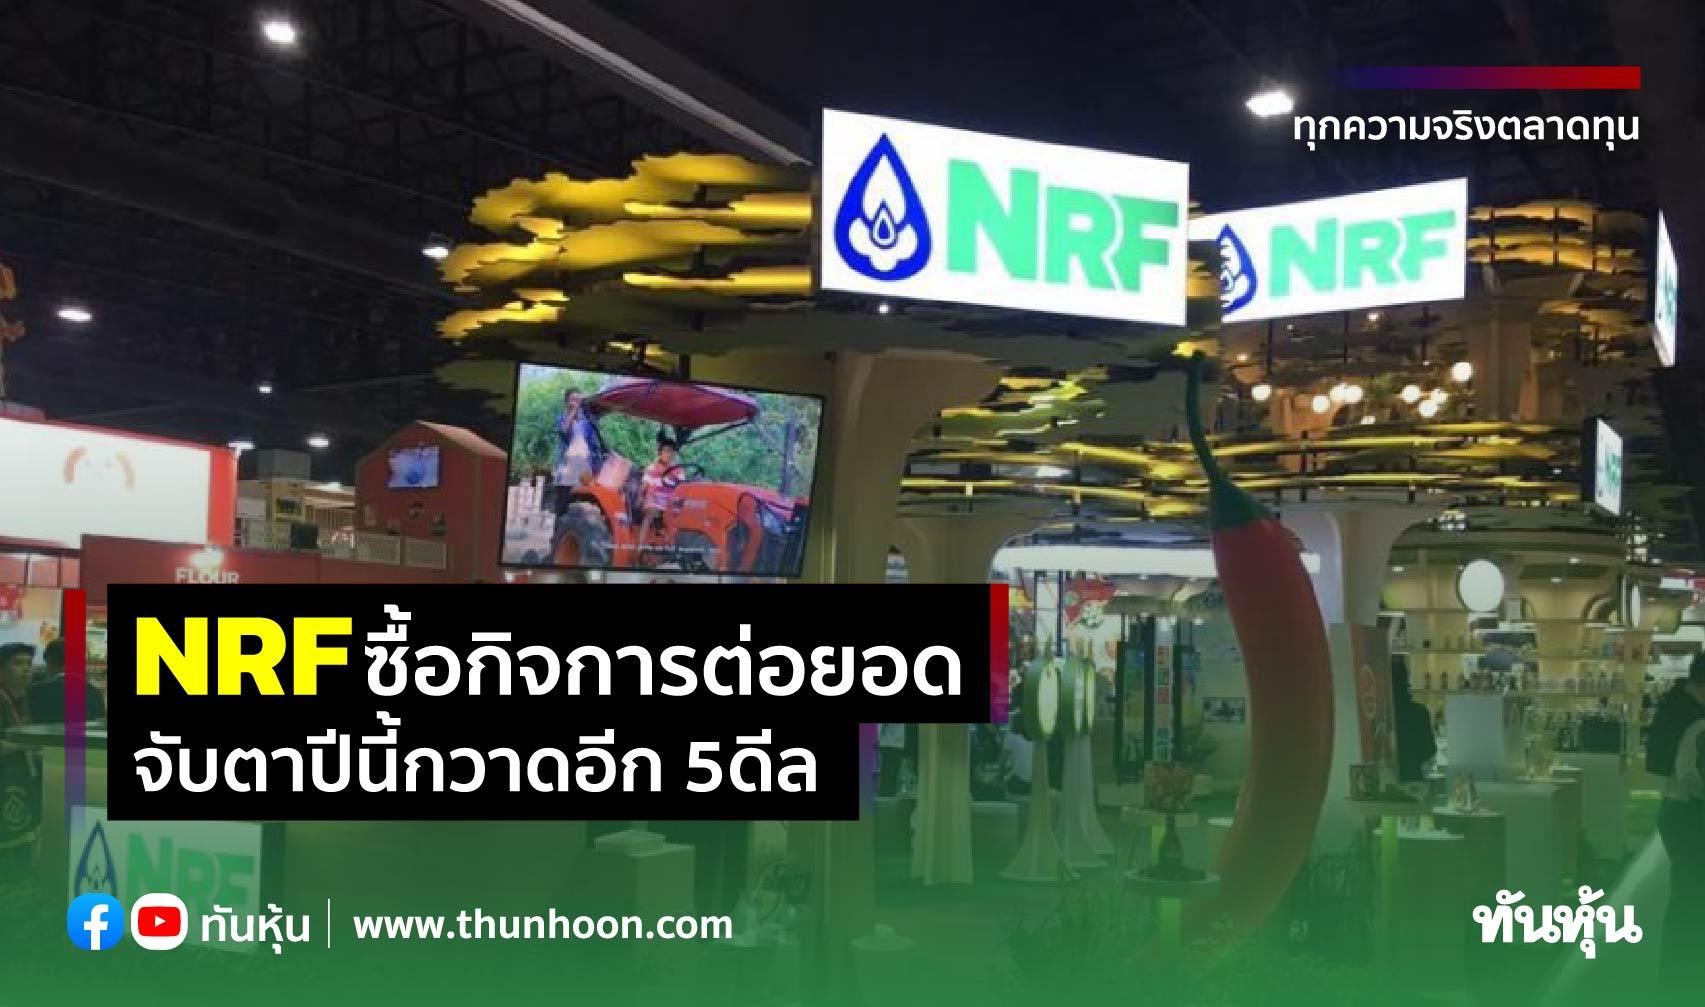 NRFซื้อกิจการต่อยอด จับตาปีนี้กวาดอีก5ดีล